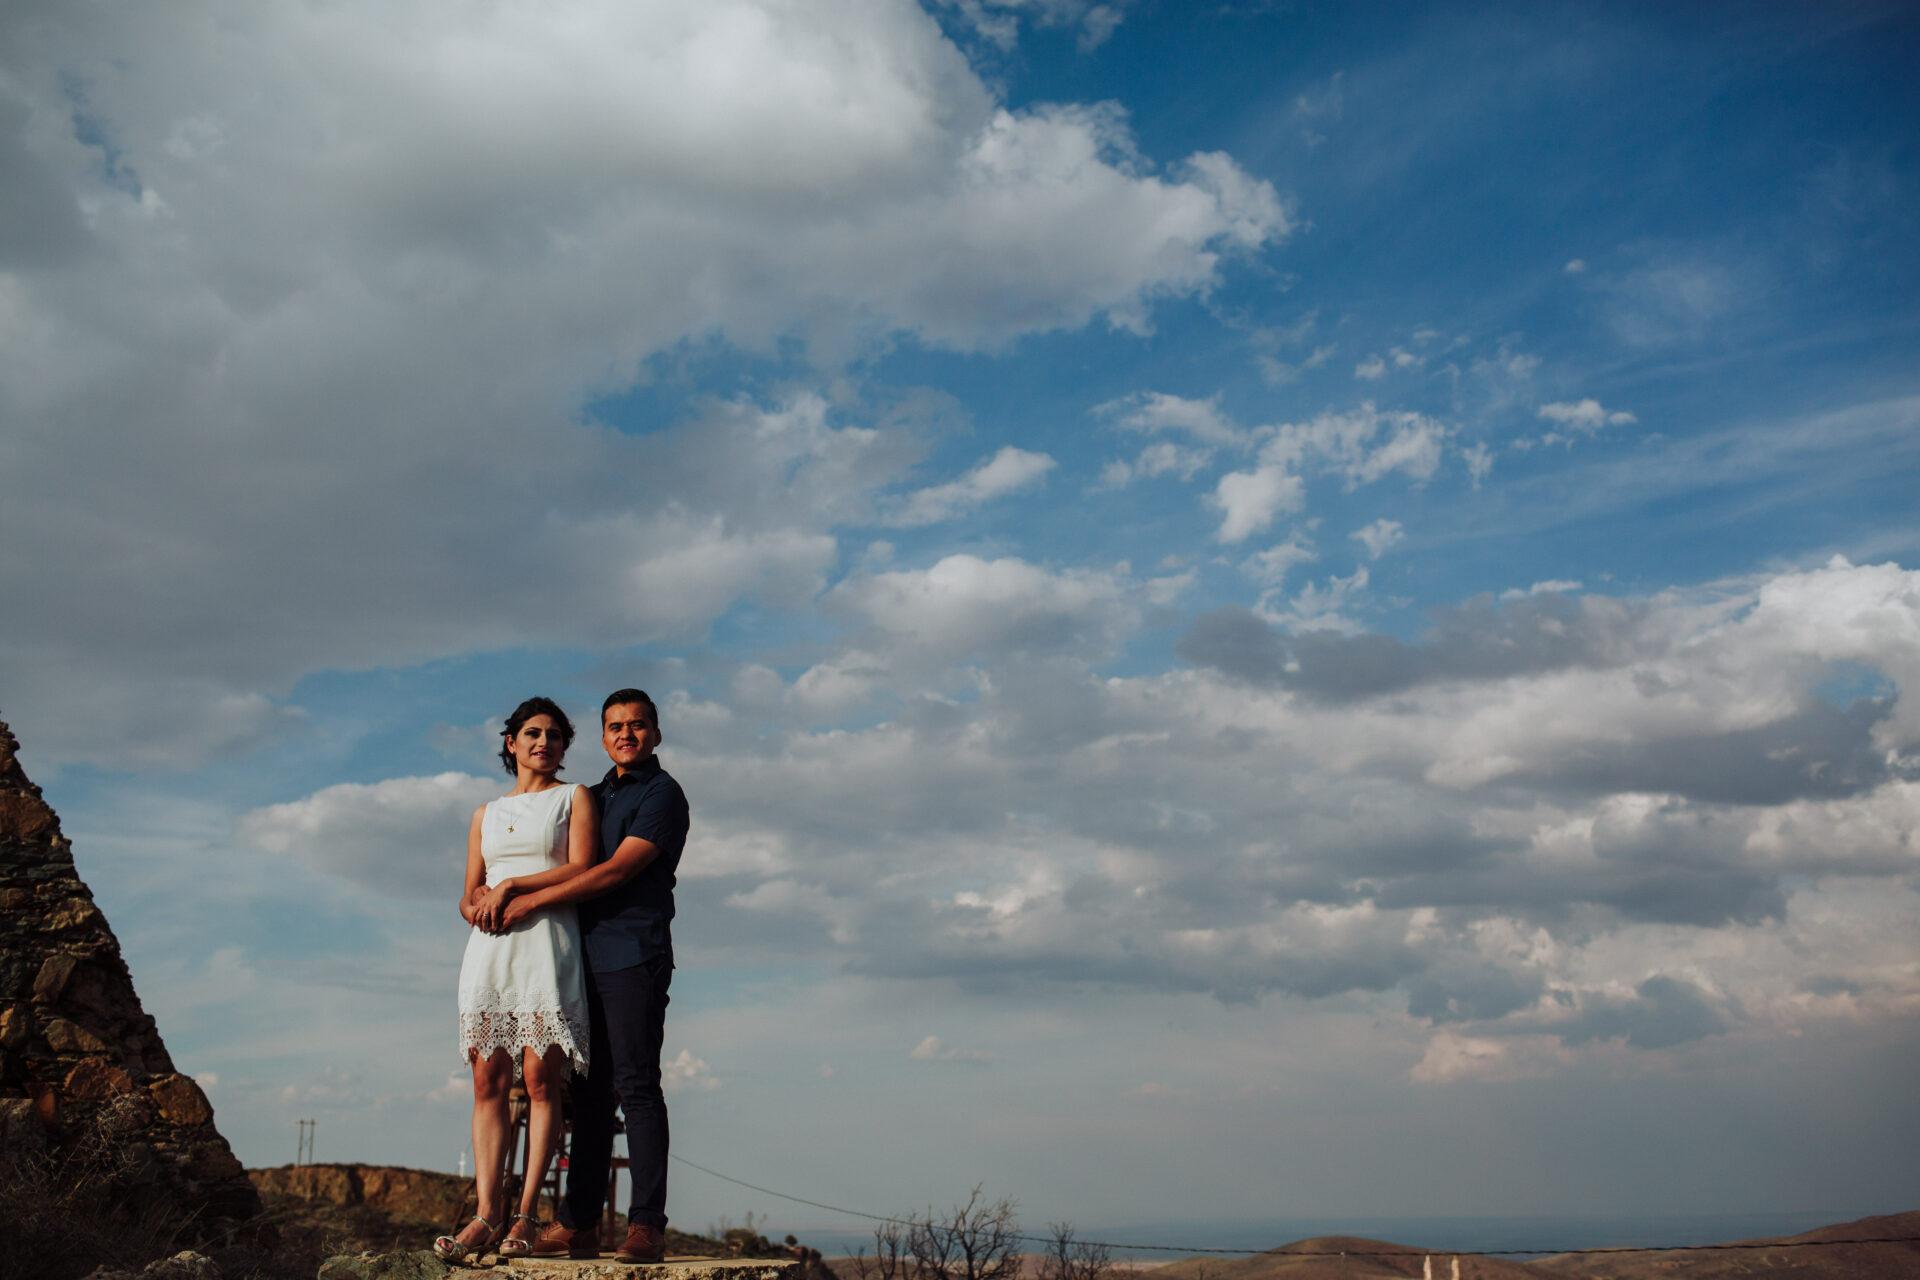 javier_noriega_fotografo_save_the_date_zacatecas_wedding_photographer6